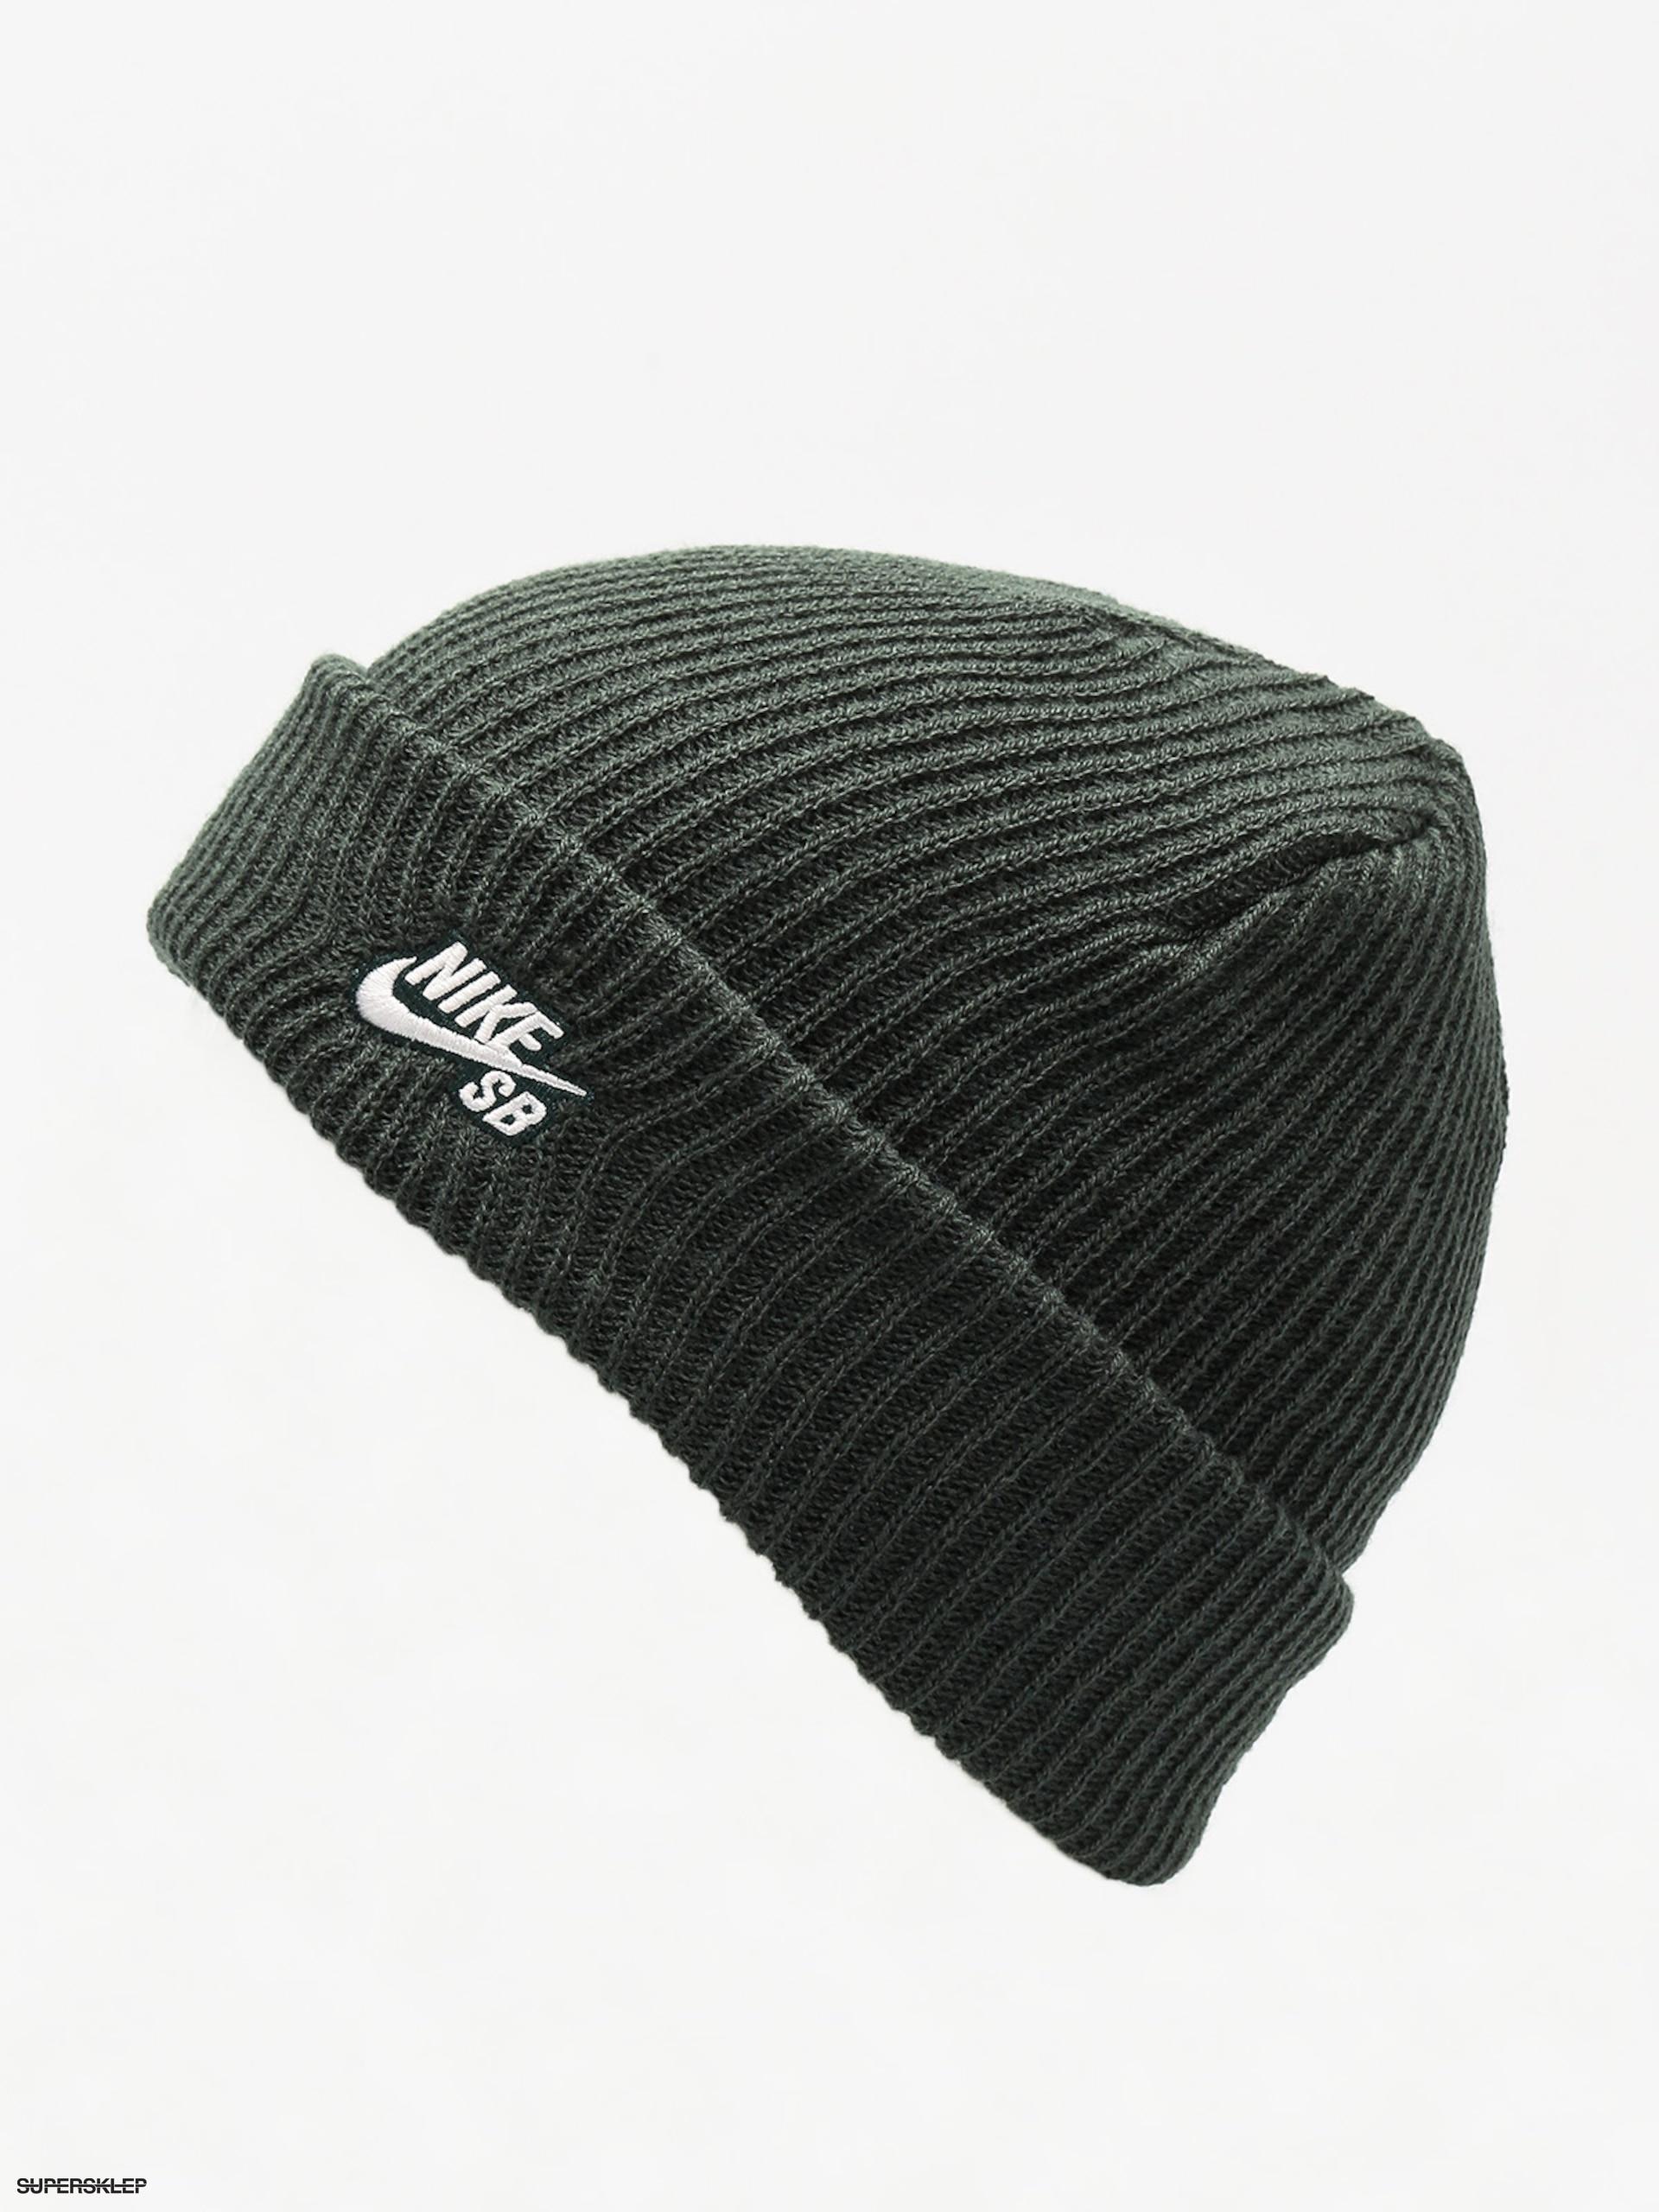 54e707be4f4 Čepice Nike SB Sb Fisherman Beanie (midnight green white)